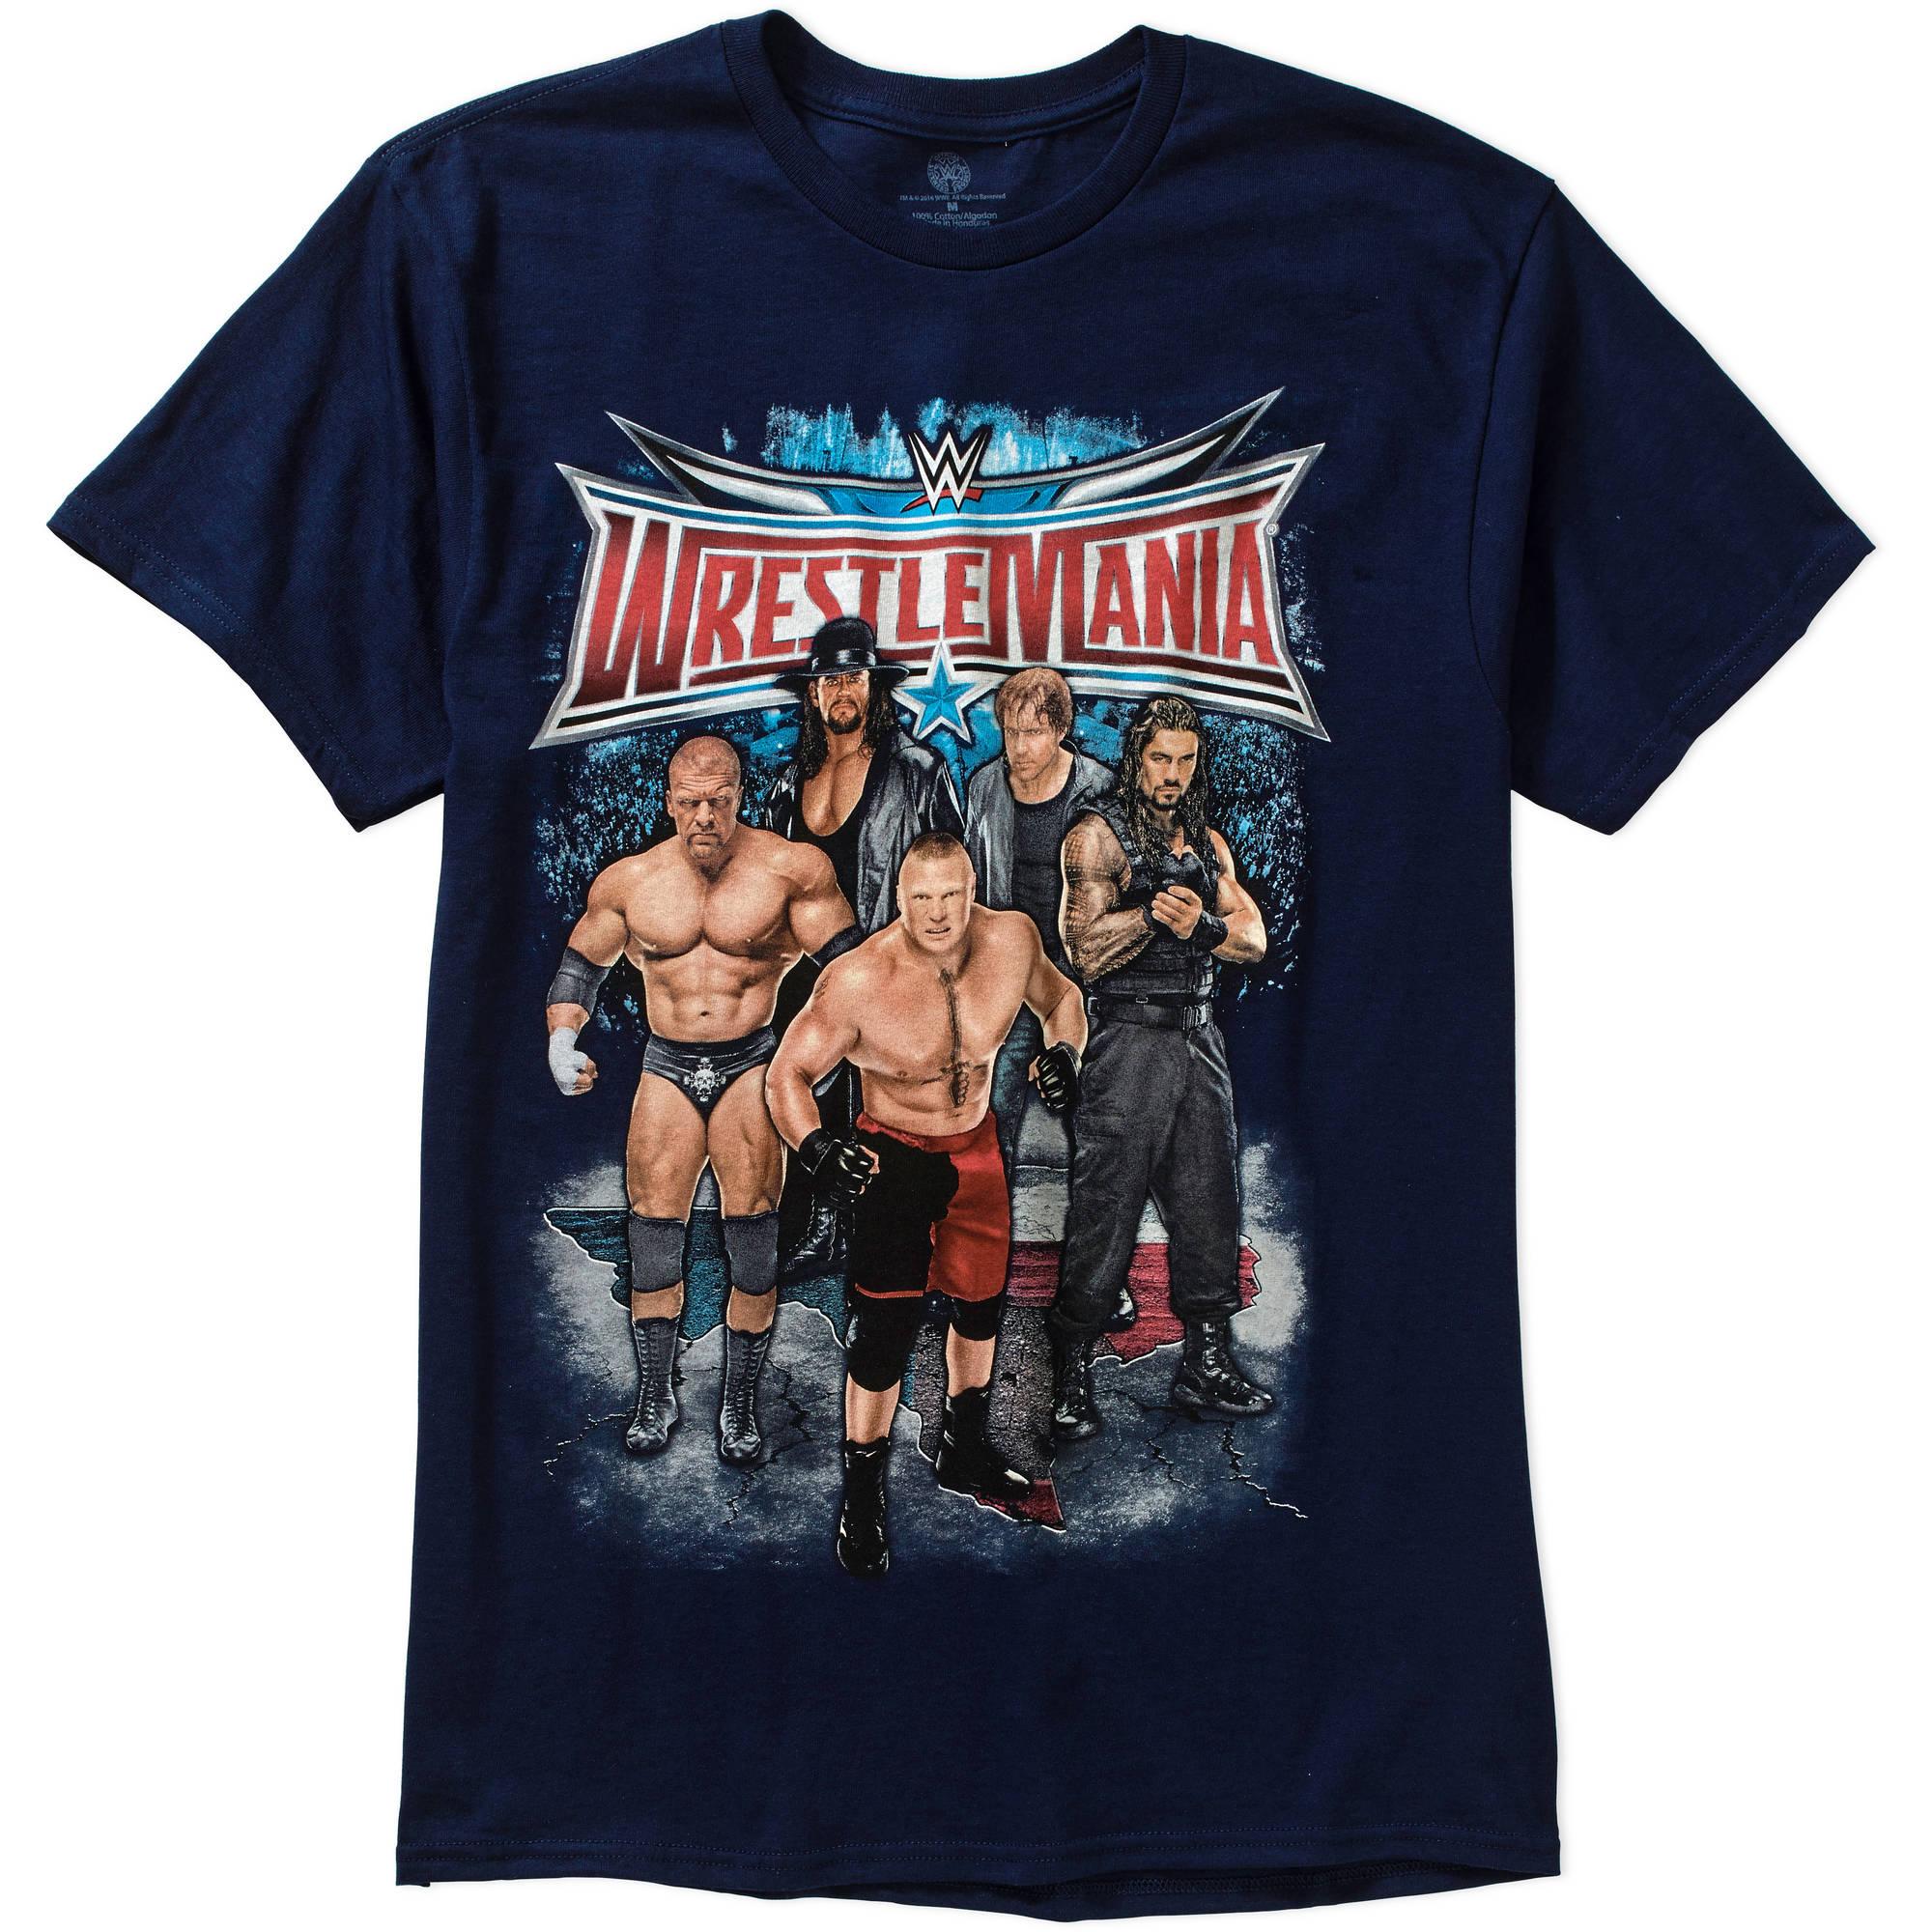 Wrestlemania Group Shot Big Men's Graphic Tee, 2XL